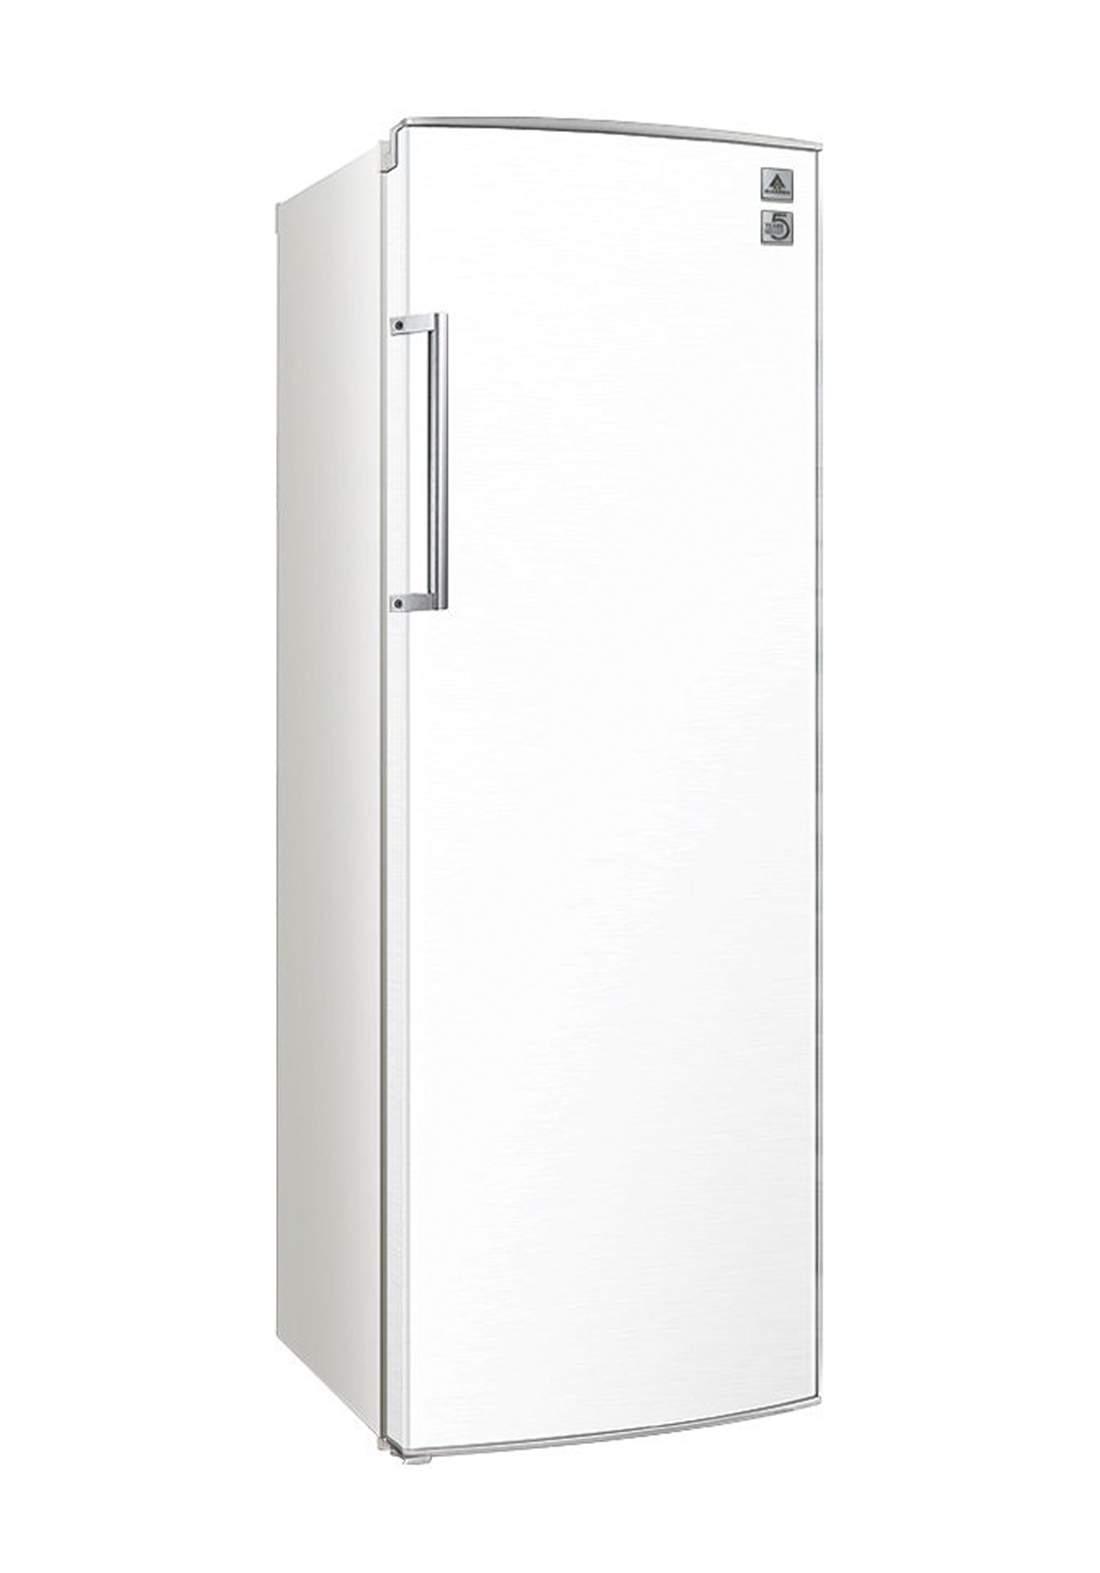 Alhafidh UFHA-325MSW Upright Freezer 11 ft مجمدة عامودية